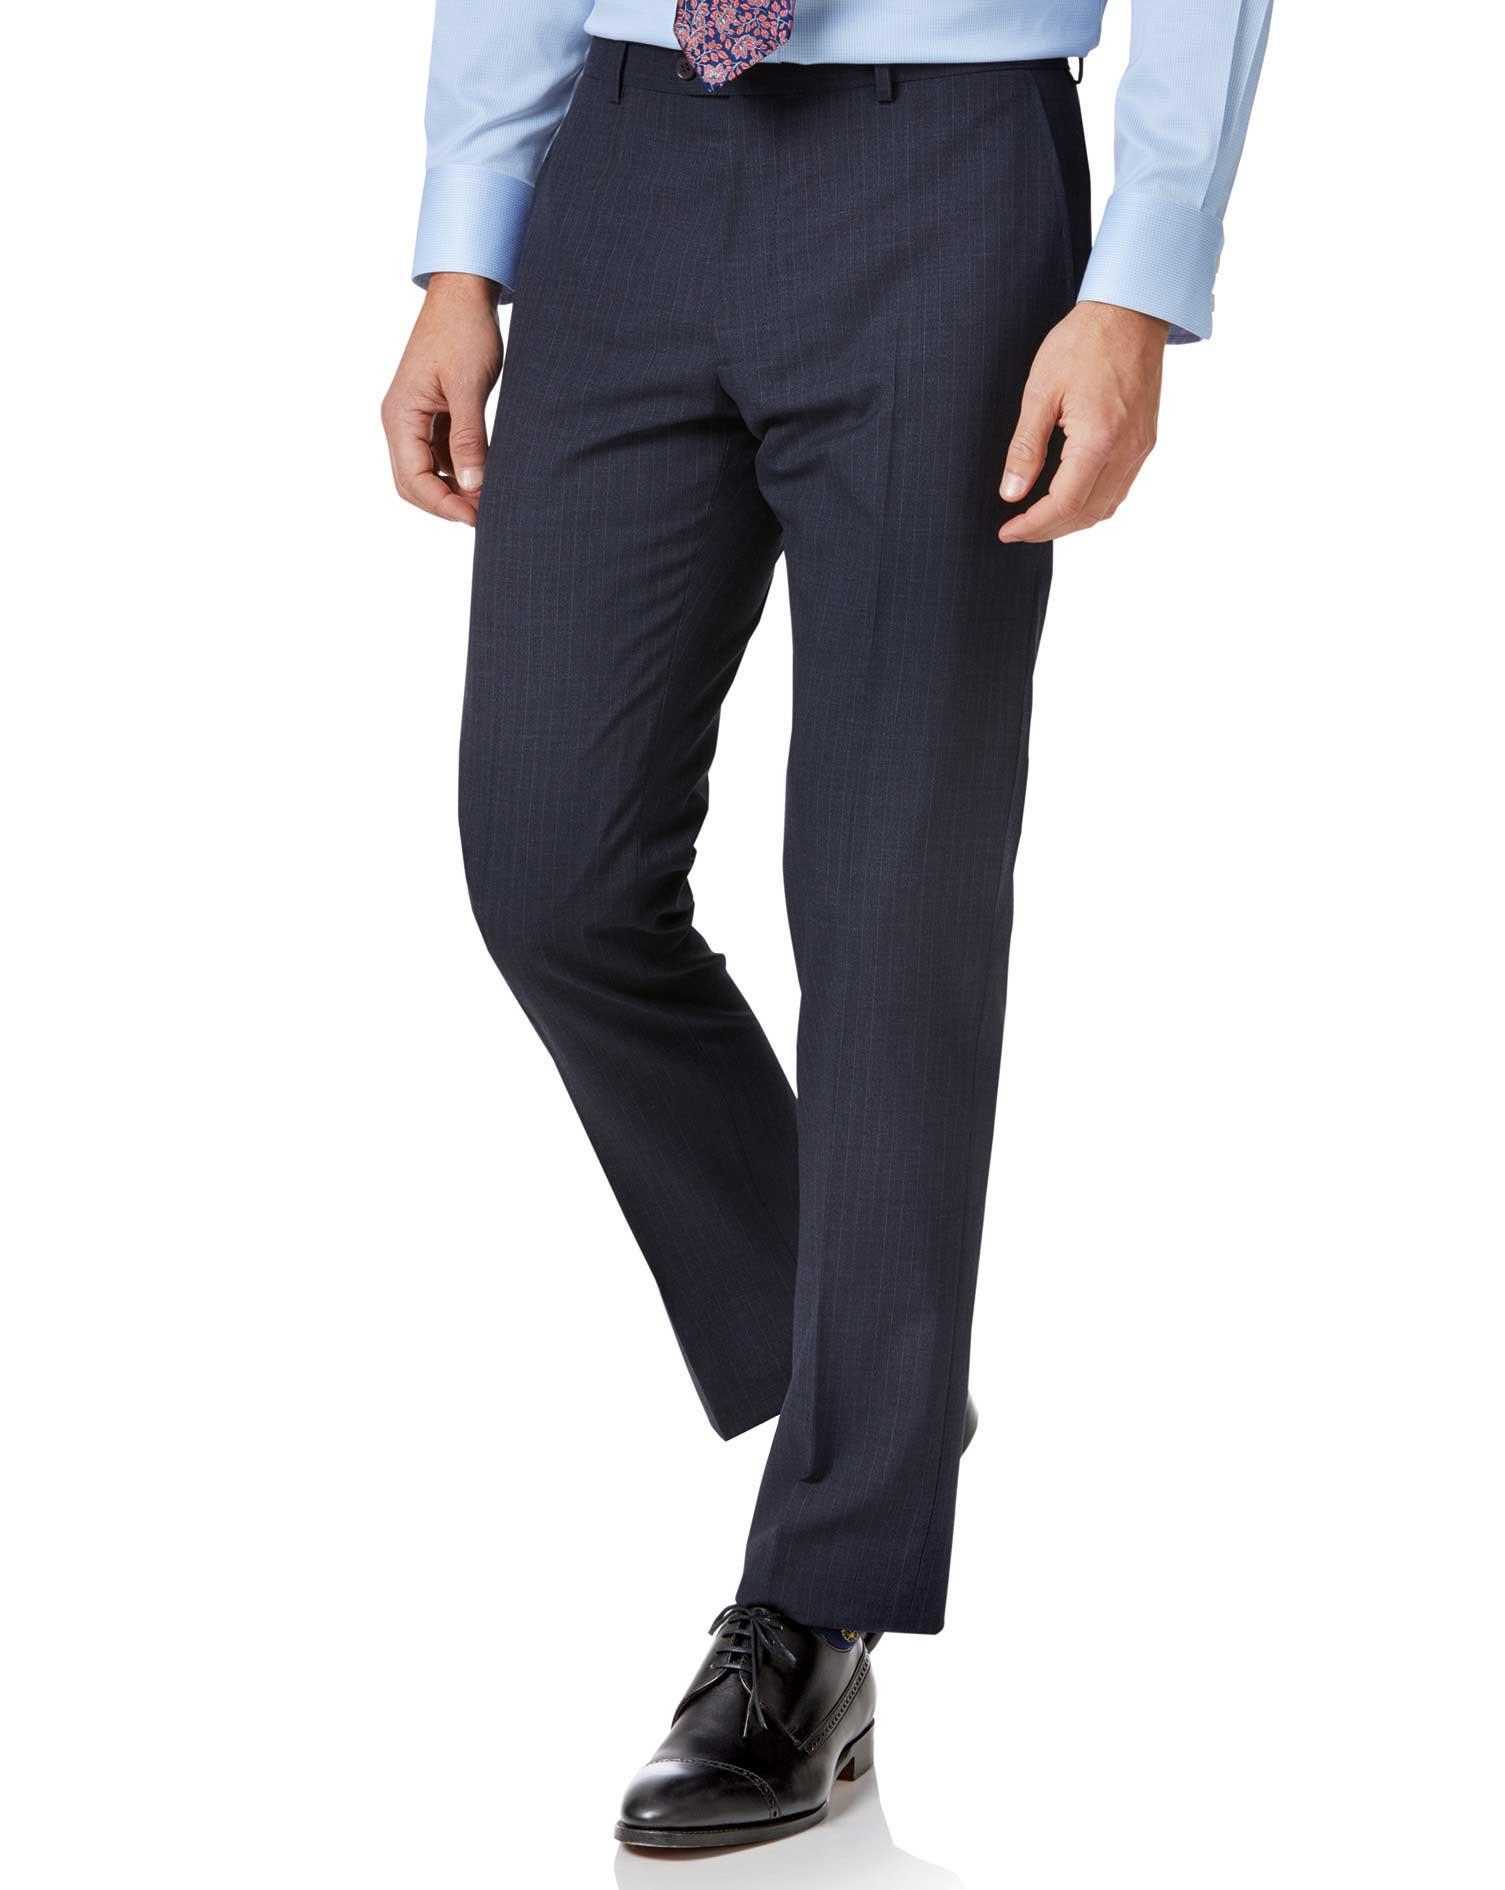 Blue Stripe Slim Fit Twist Business Suit Trouser Size W34 L38 by Charles Tyrwhitt